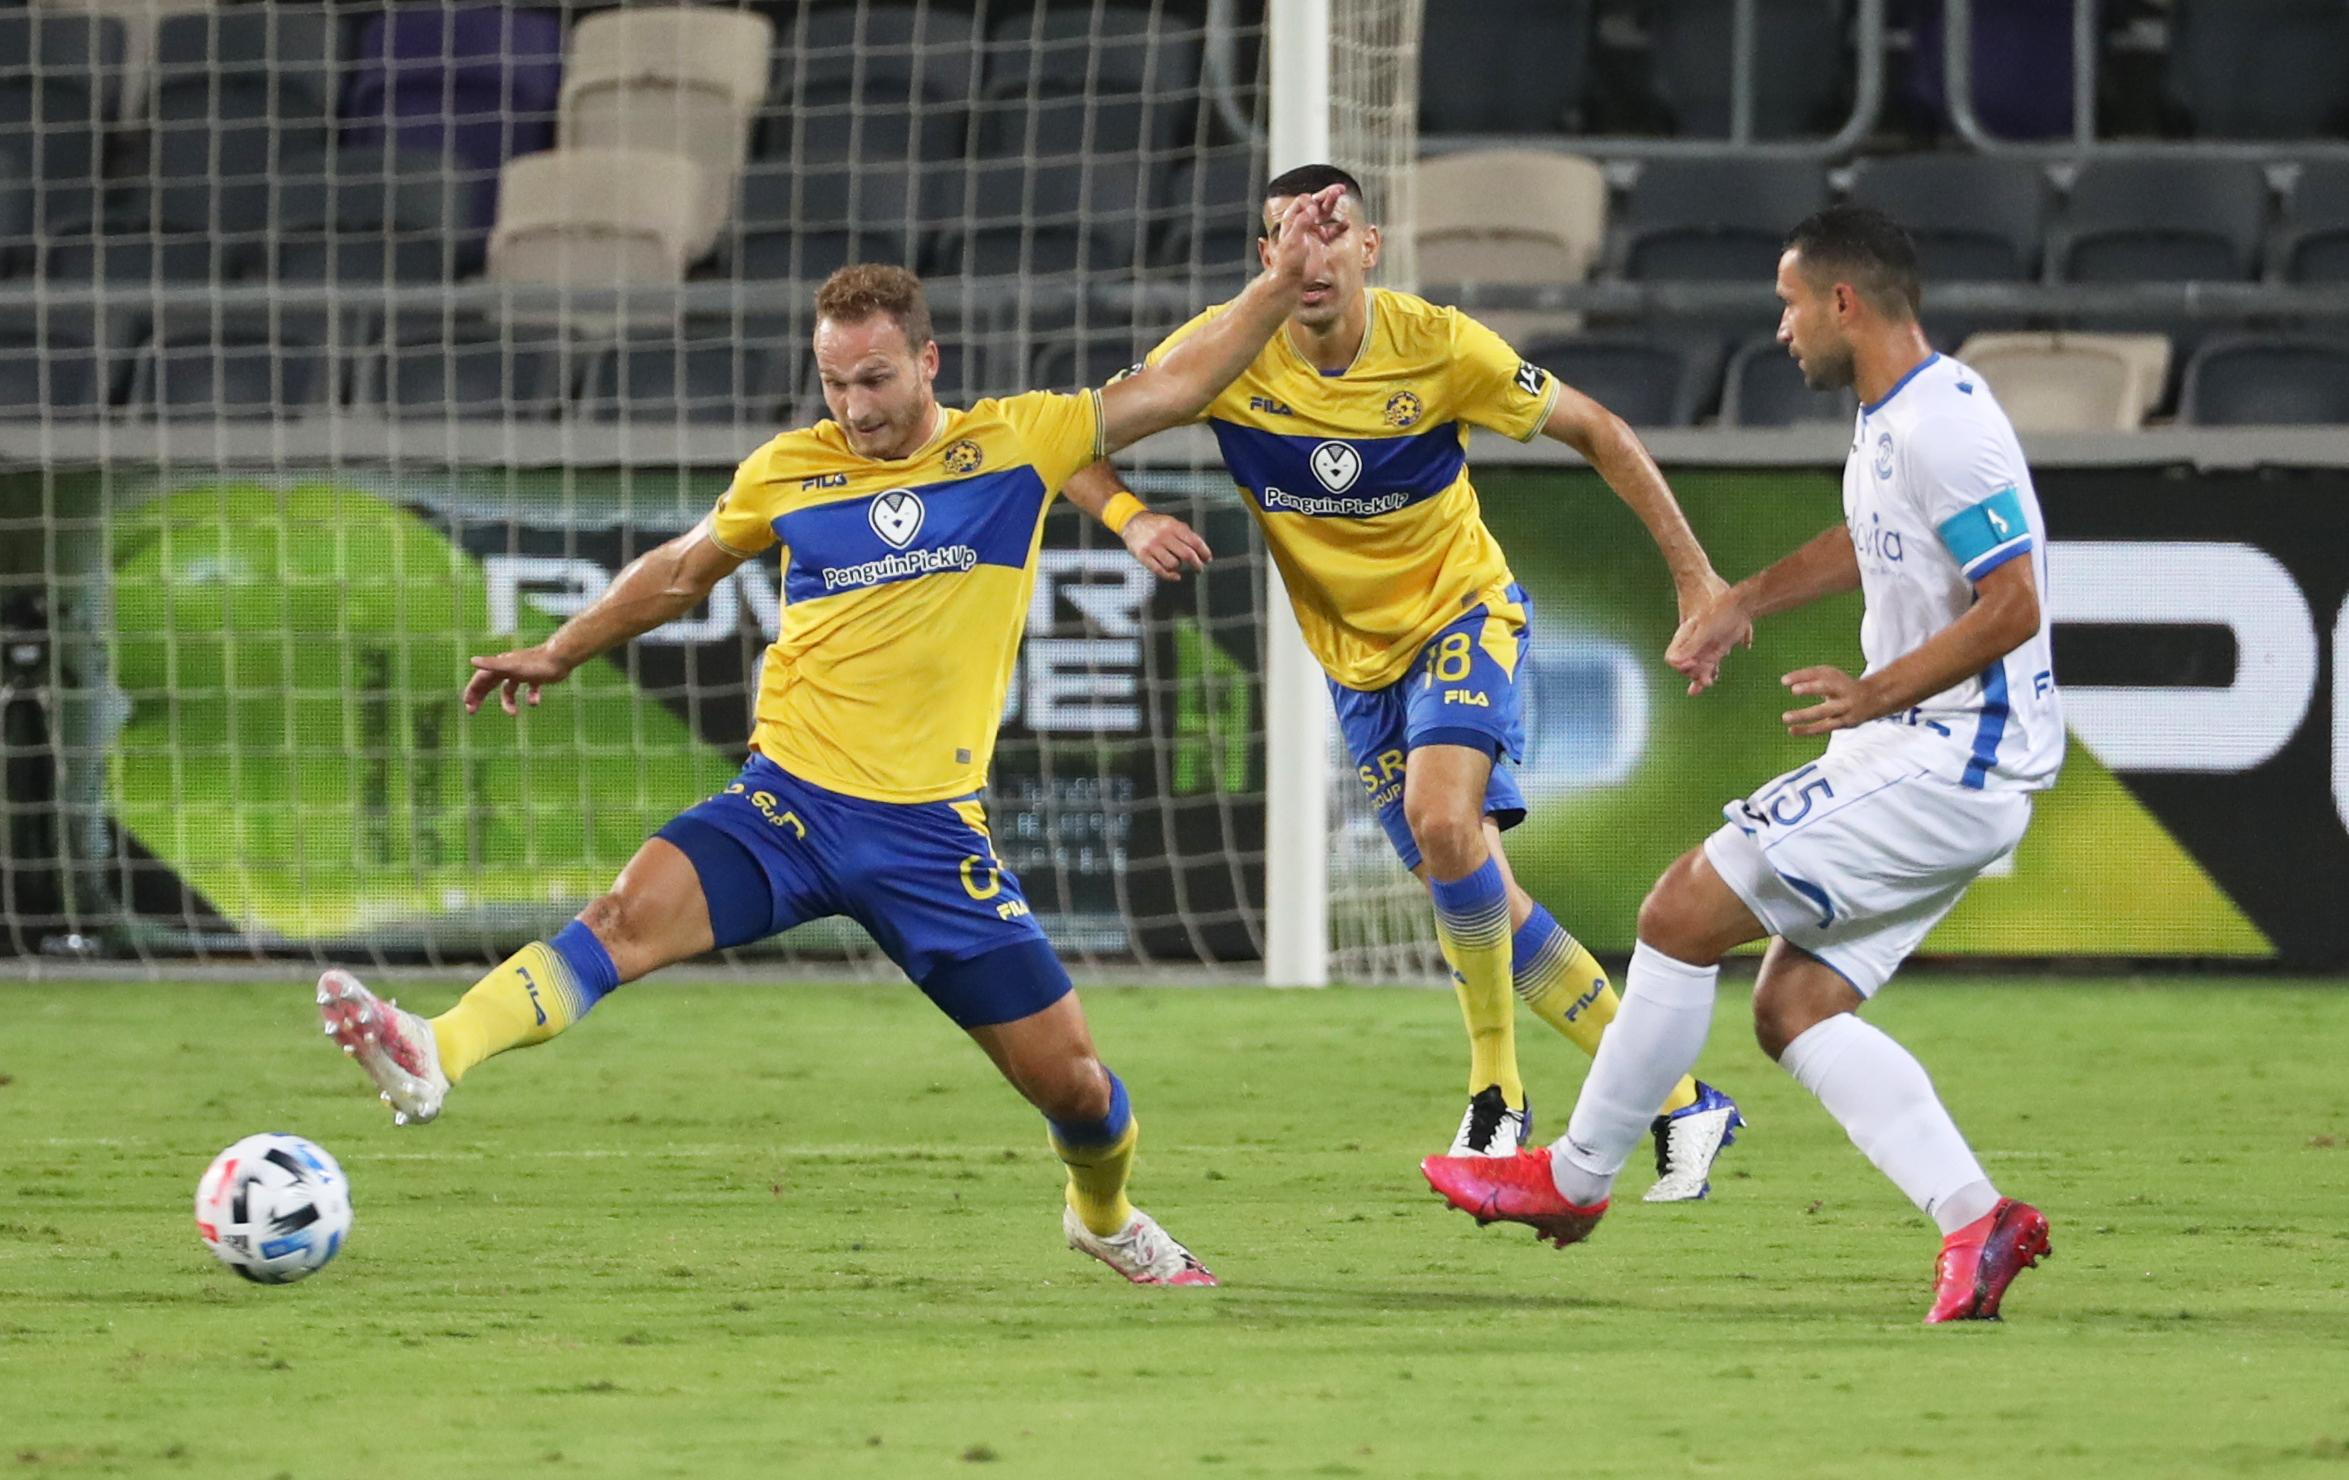 Corona-Fall bei Salzburgs CL-Gegner Maccabi Tel Aviv